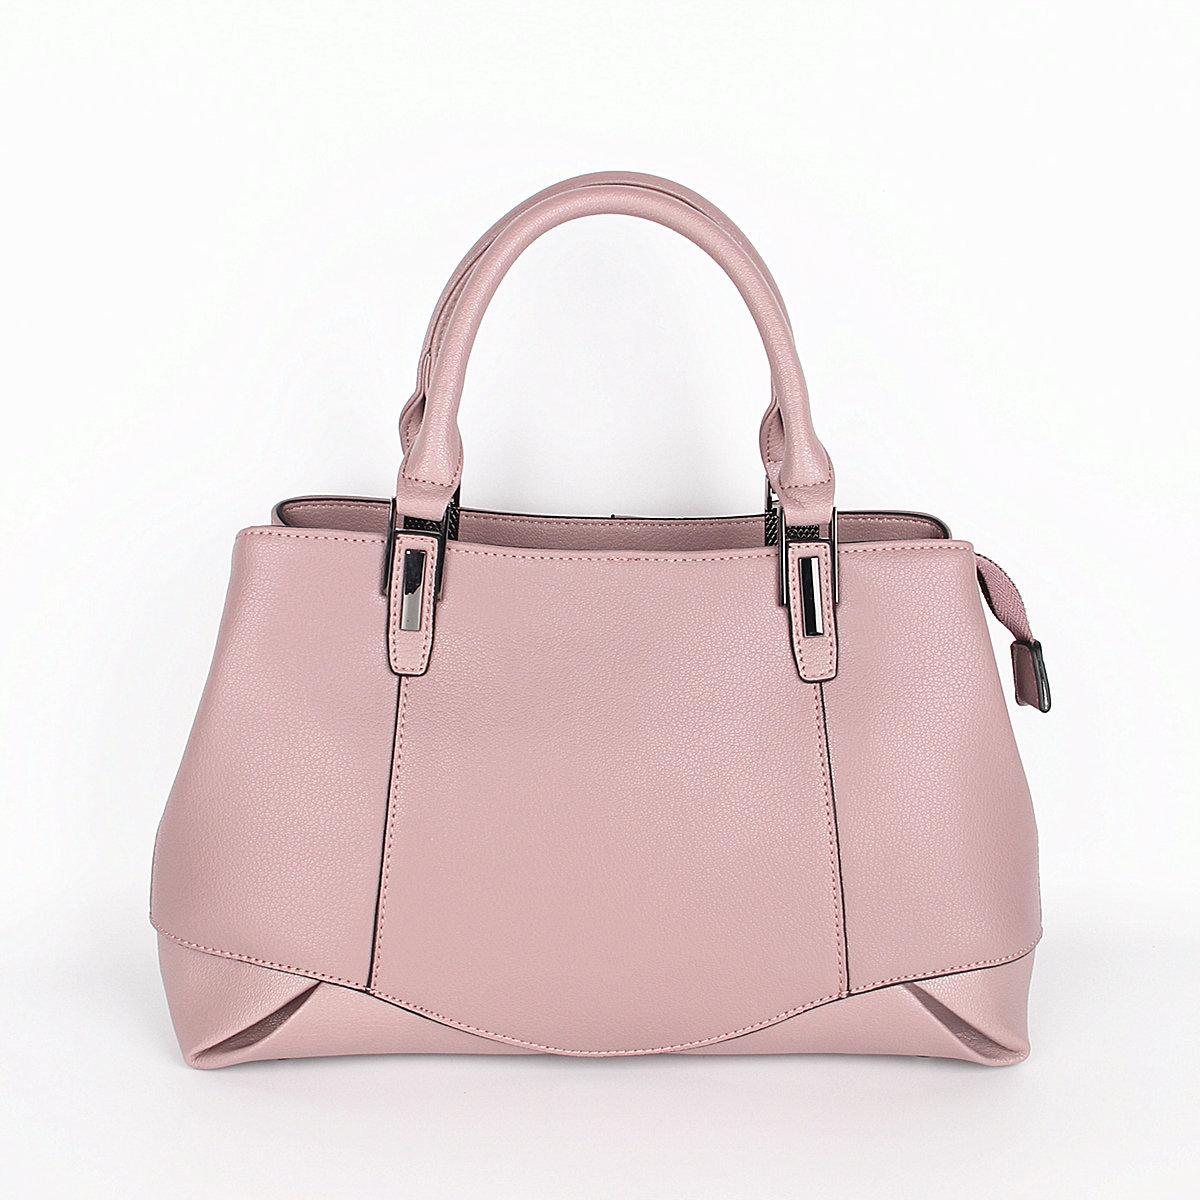 Designer Genuine Leather Bags Ladies Famous Brand Women Handbags High Quality Tote Bag for Women Fashion Hobos Bolsos